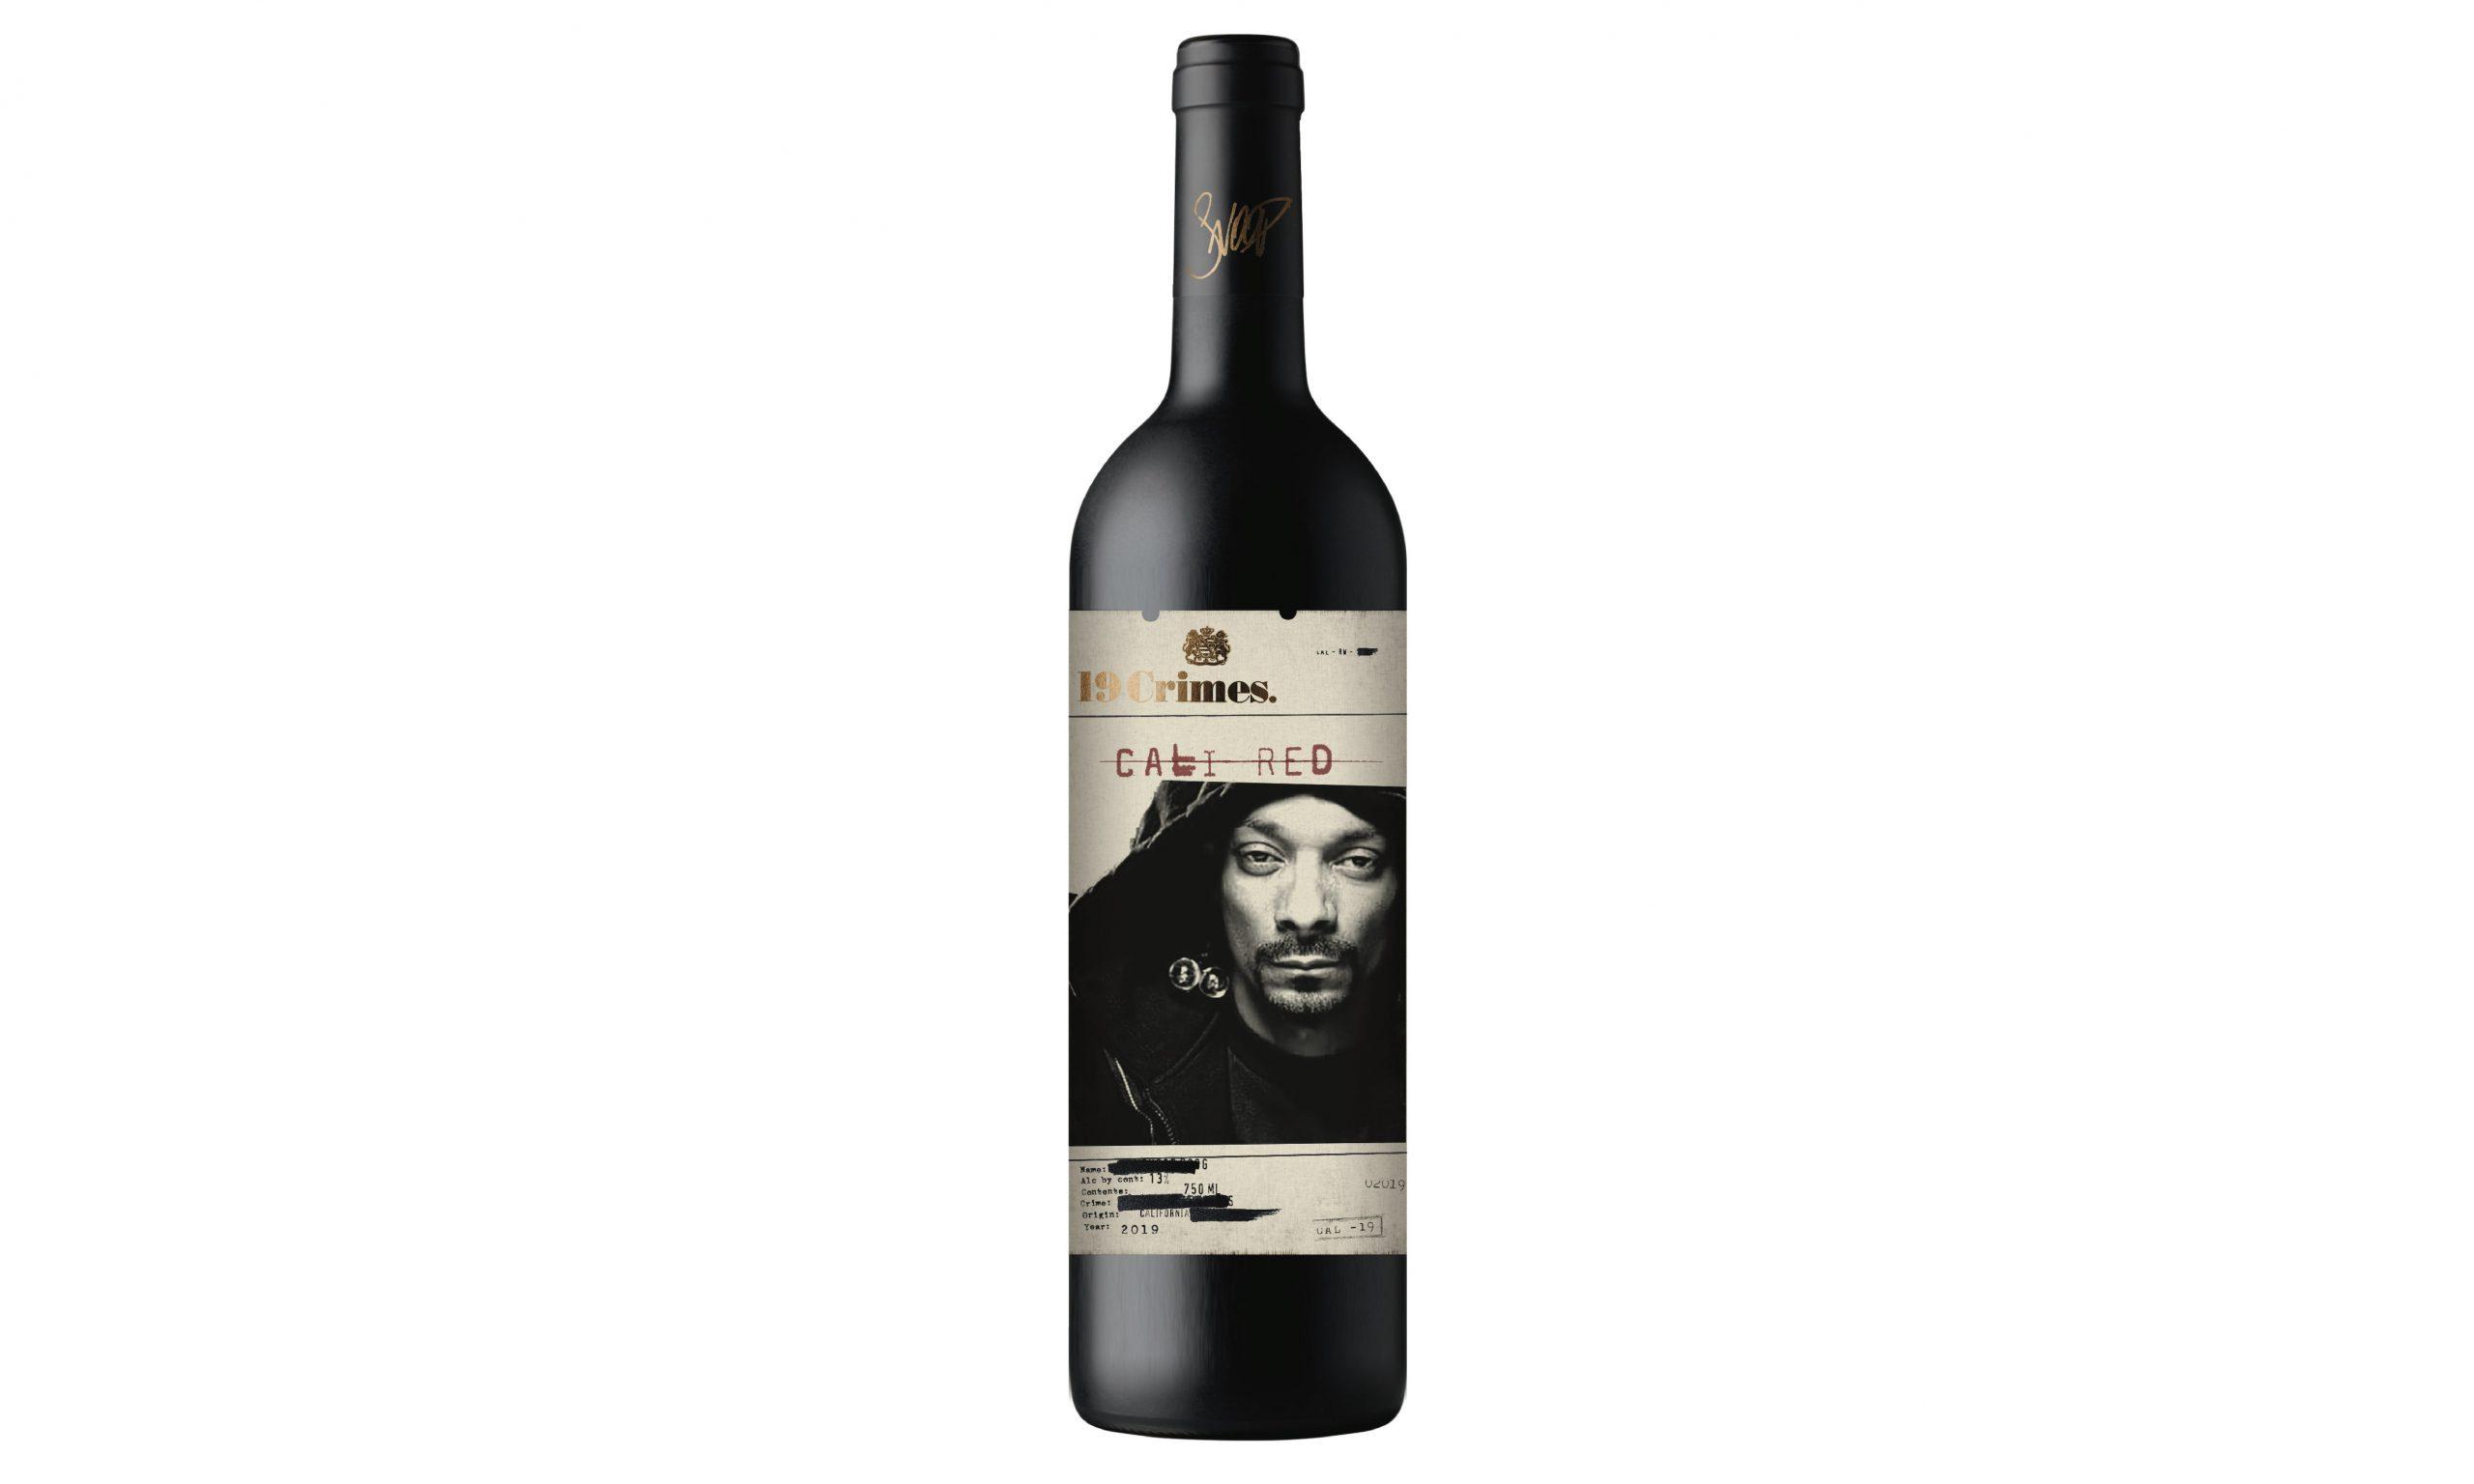 Snoop Dogg 将推出葡萄酒产品「Snoop Cali Red」